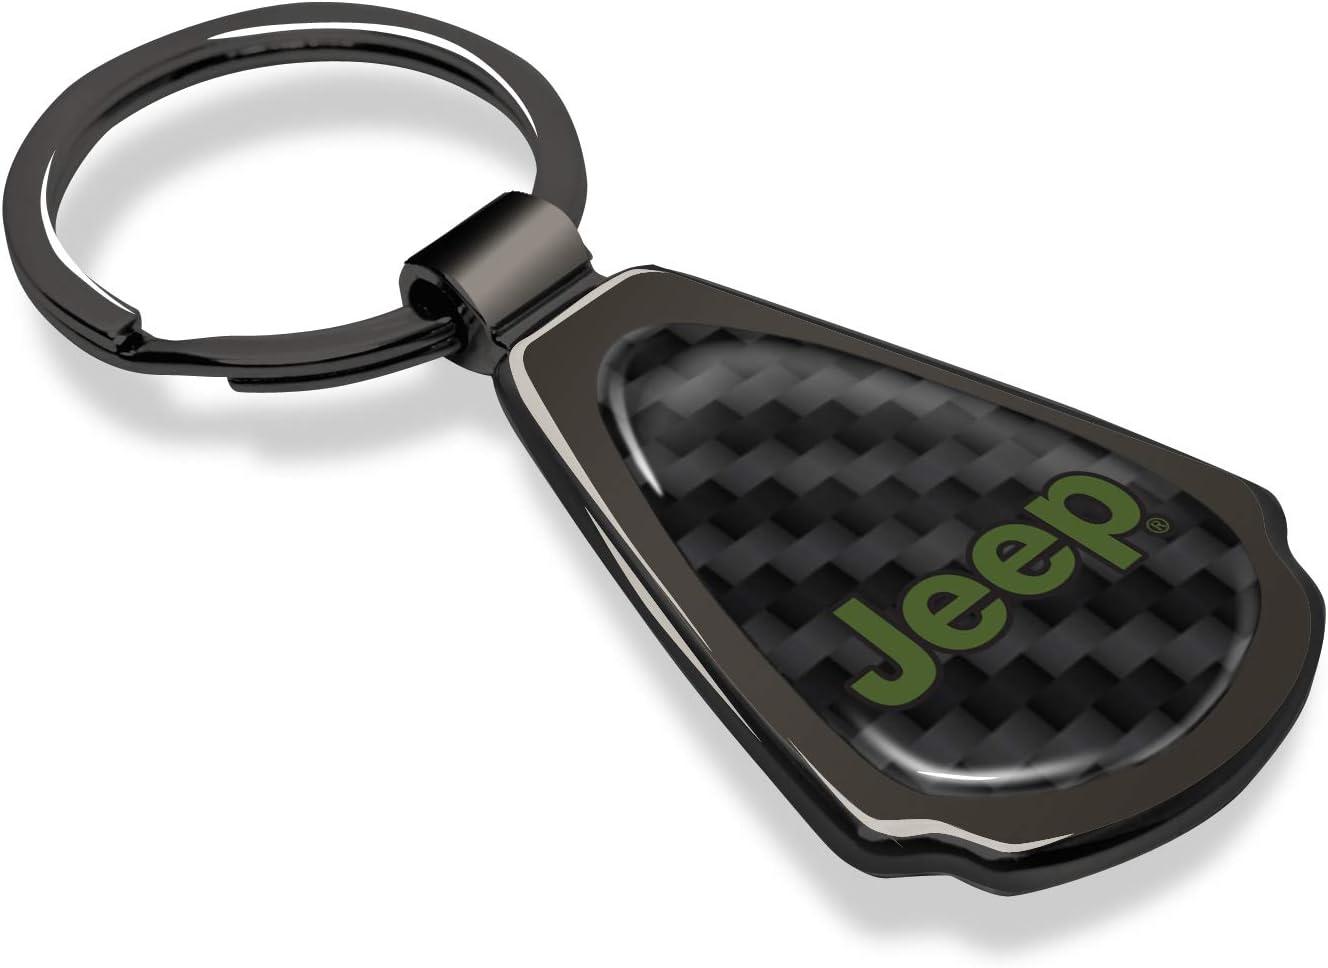 Jeep in Green Real Black Carbon Fiber Gunmetal Black Metal Teardrop Key Chain iPick Image for